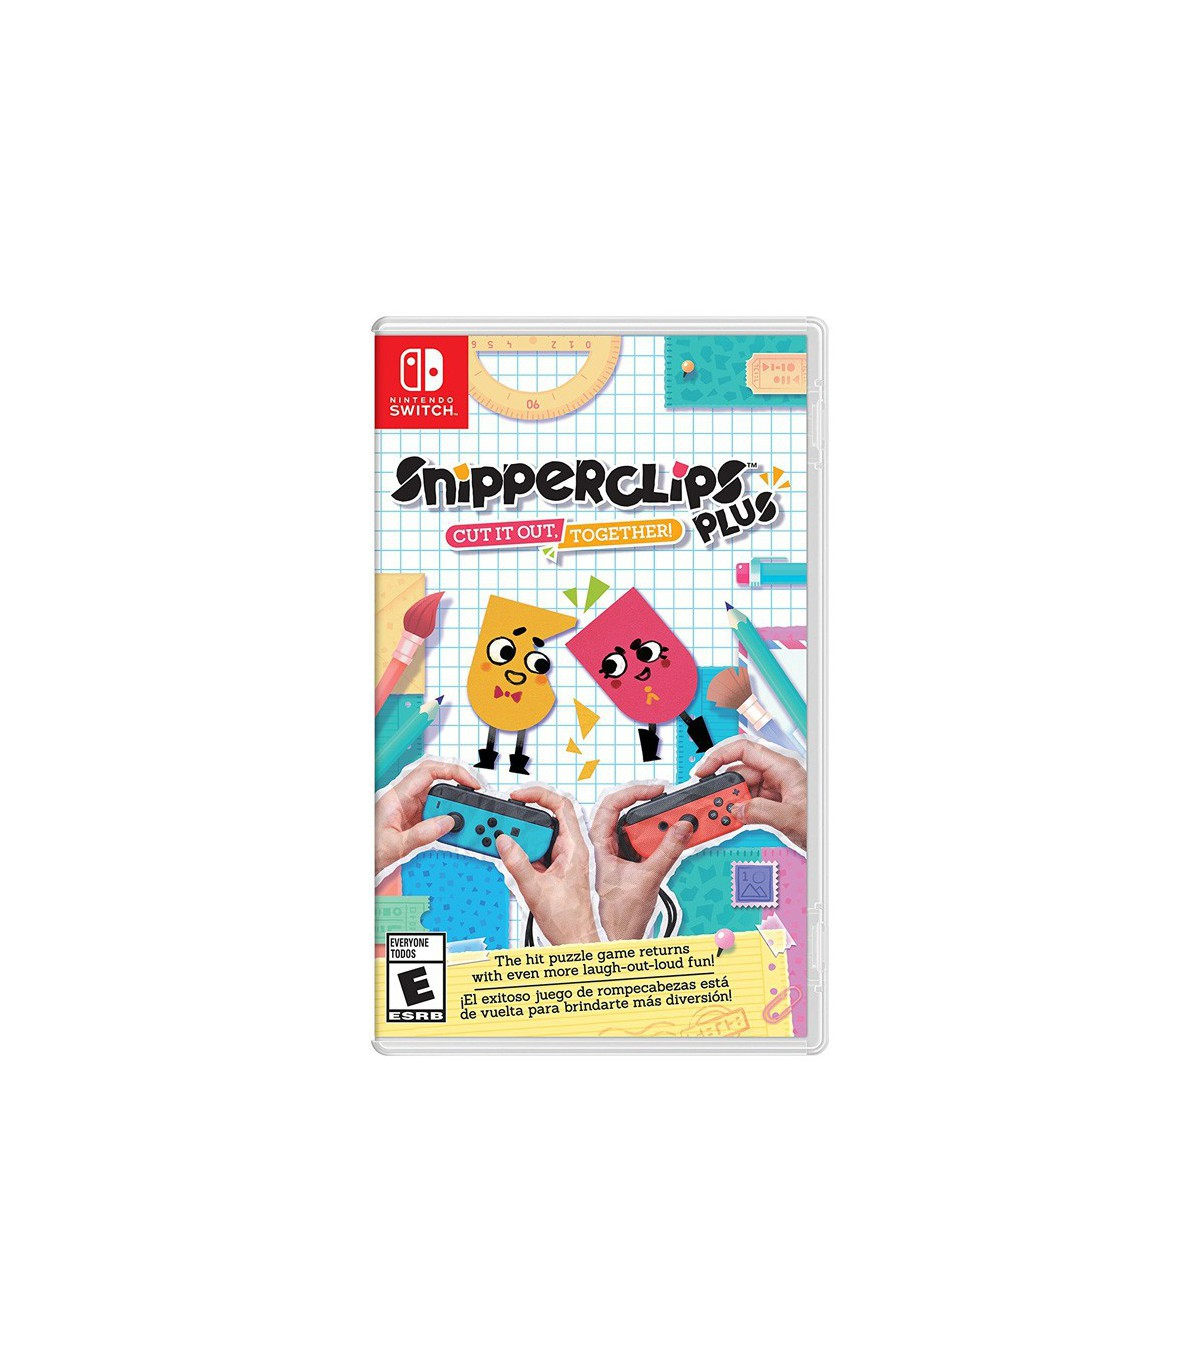 بازی Snipperclips Plus: Cut It Out Together - نینتندو سوئیچ